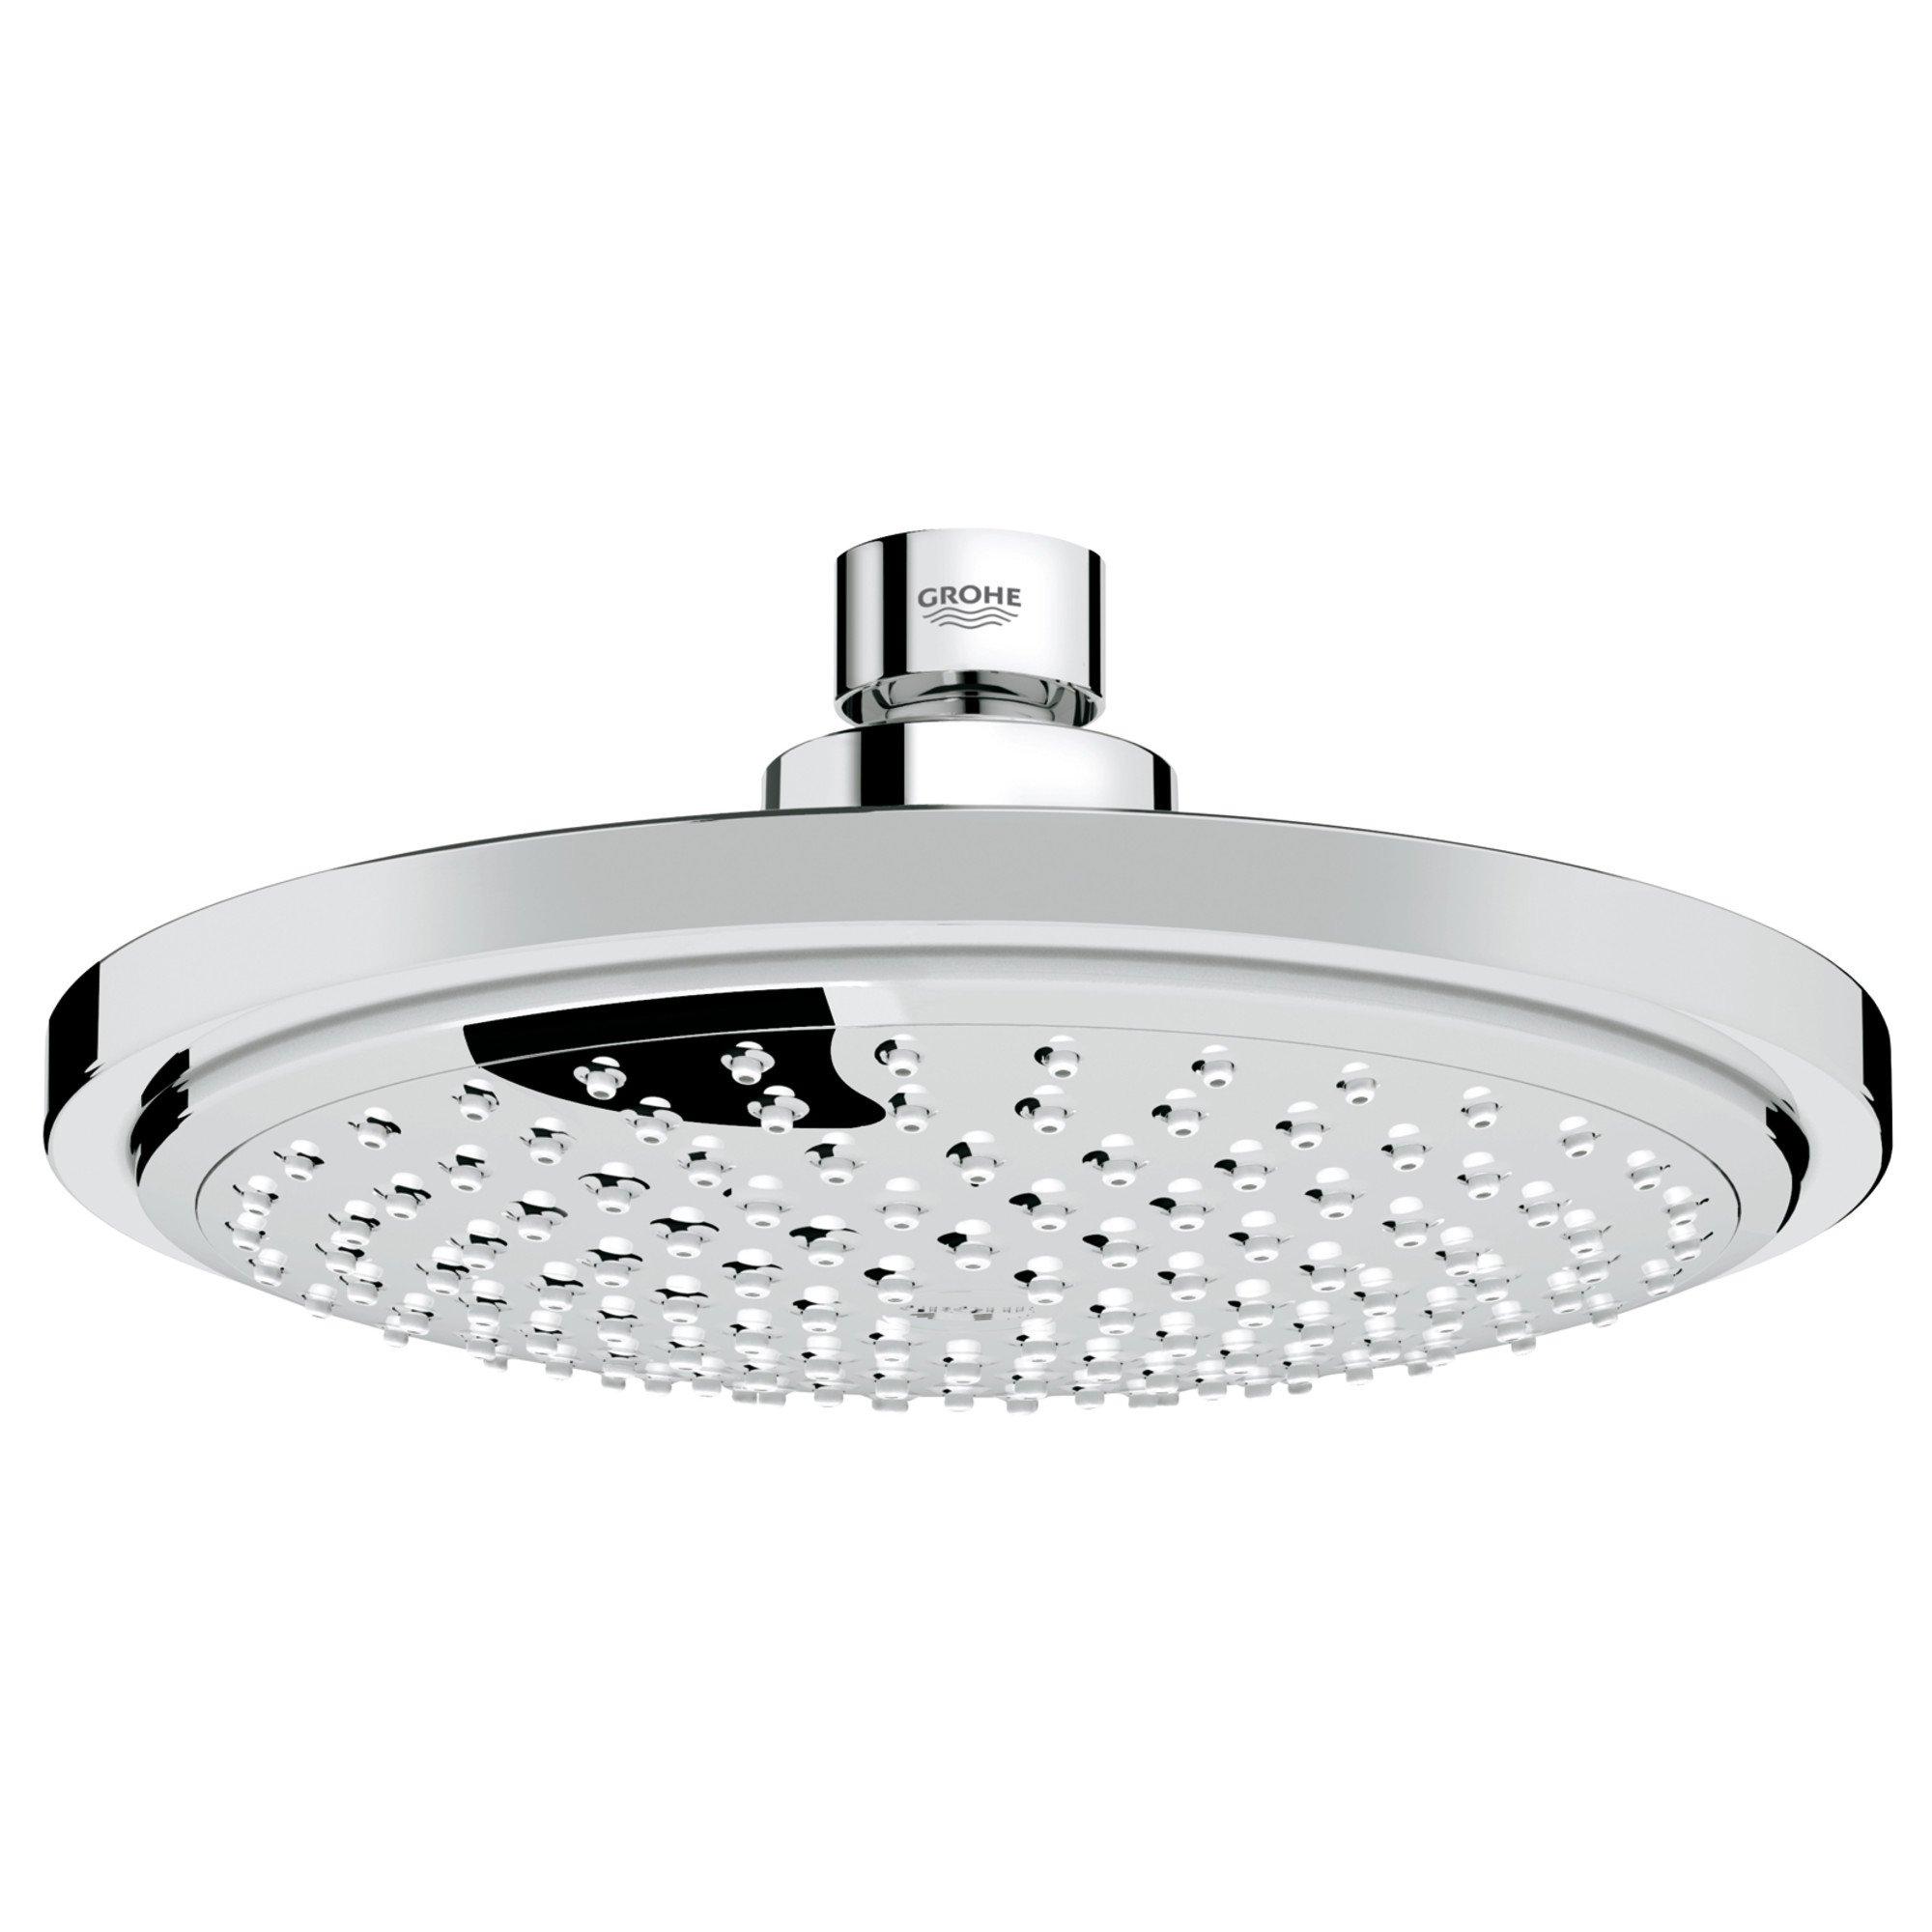 Euphoria Cosmopolitan 180 1-Spray Fixed Showerhead